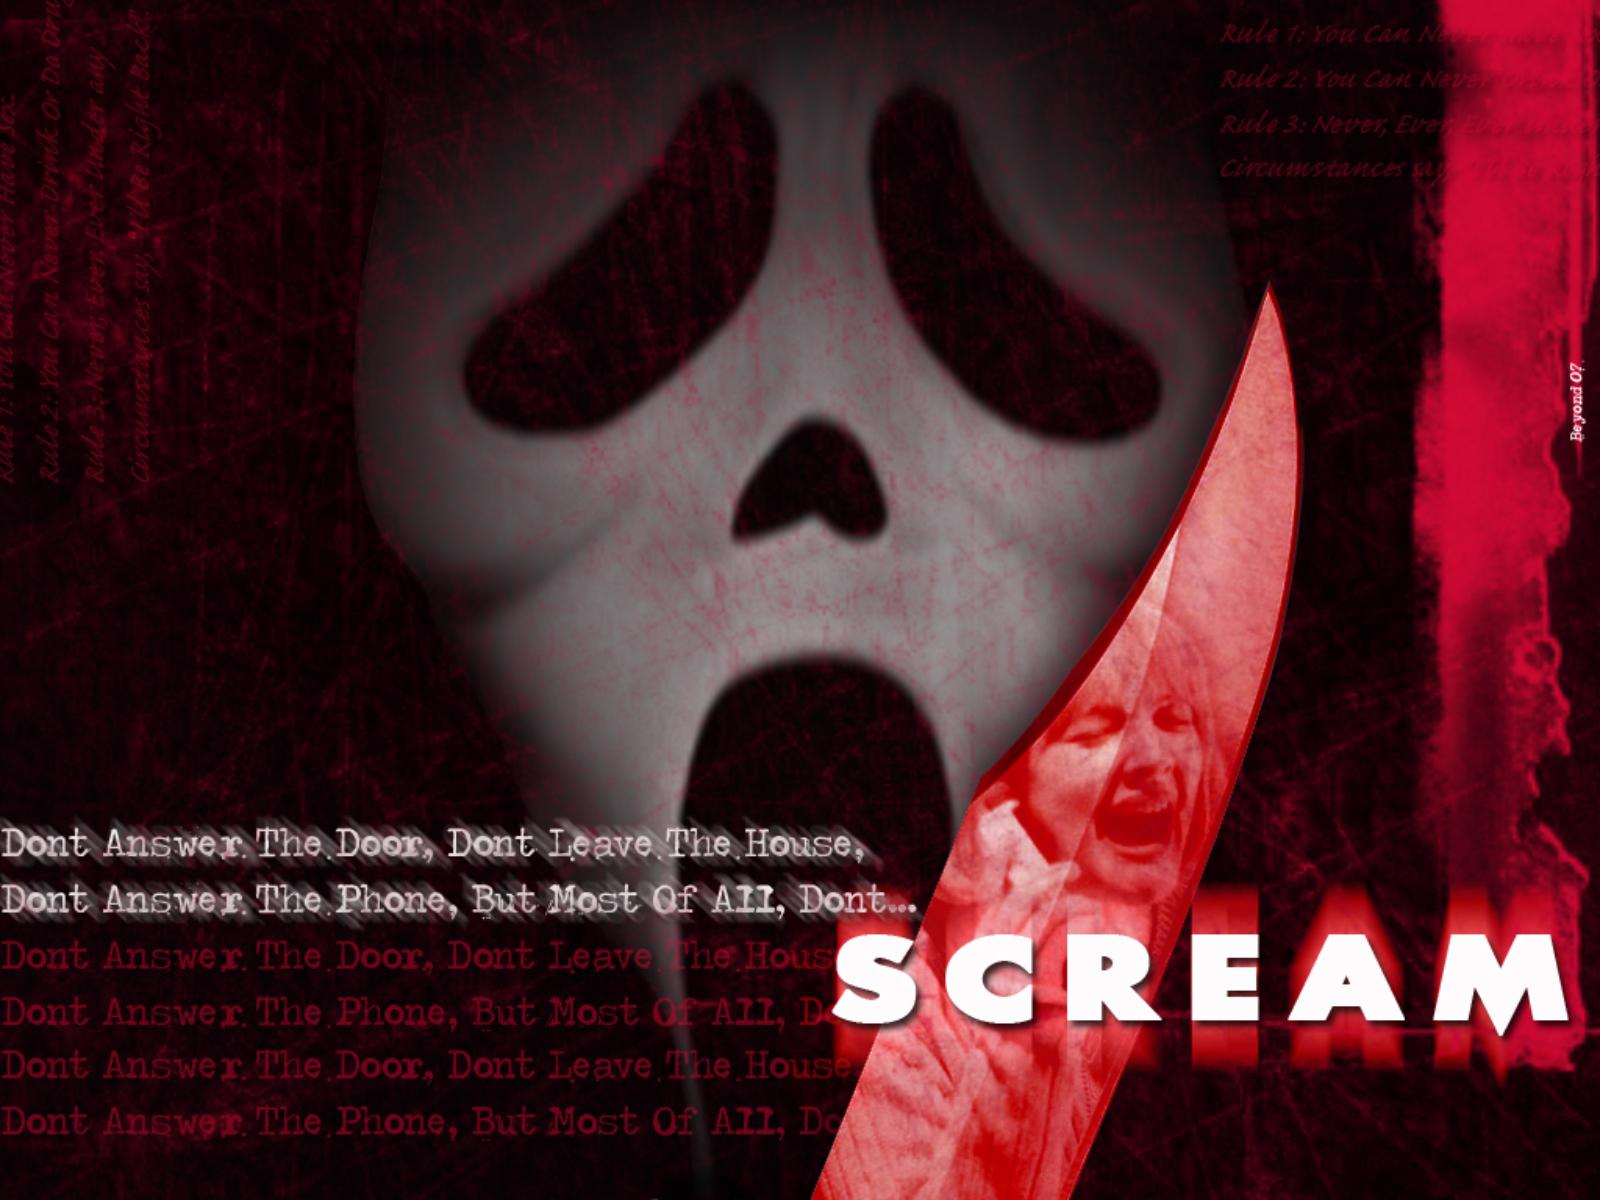 Scream wallpaper